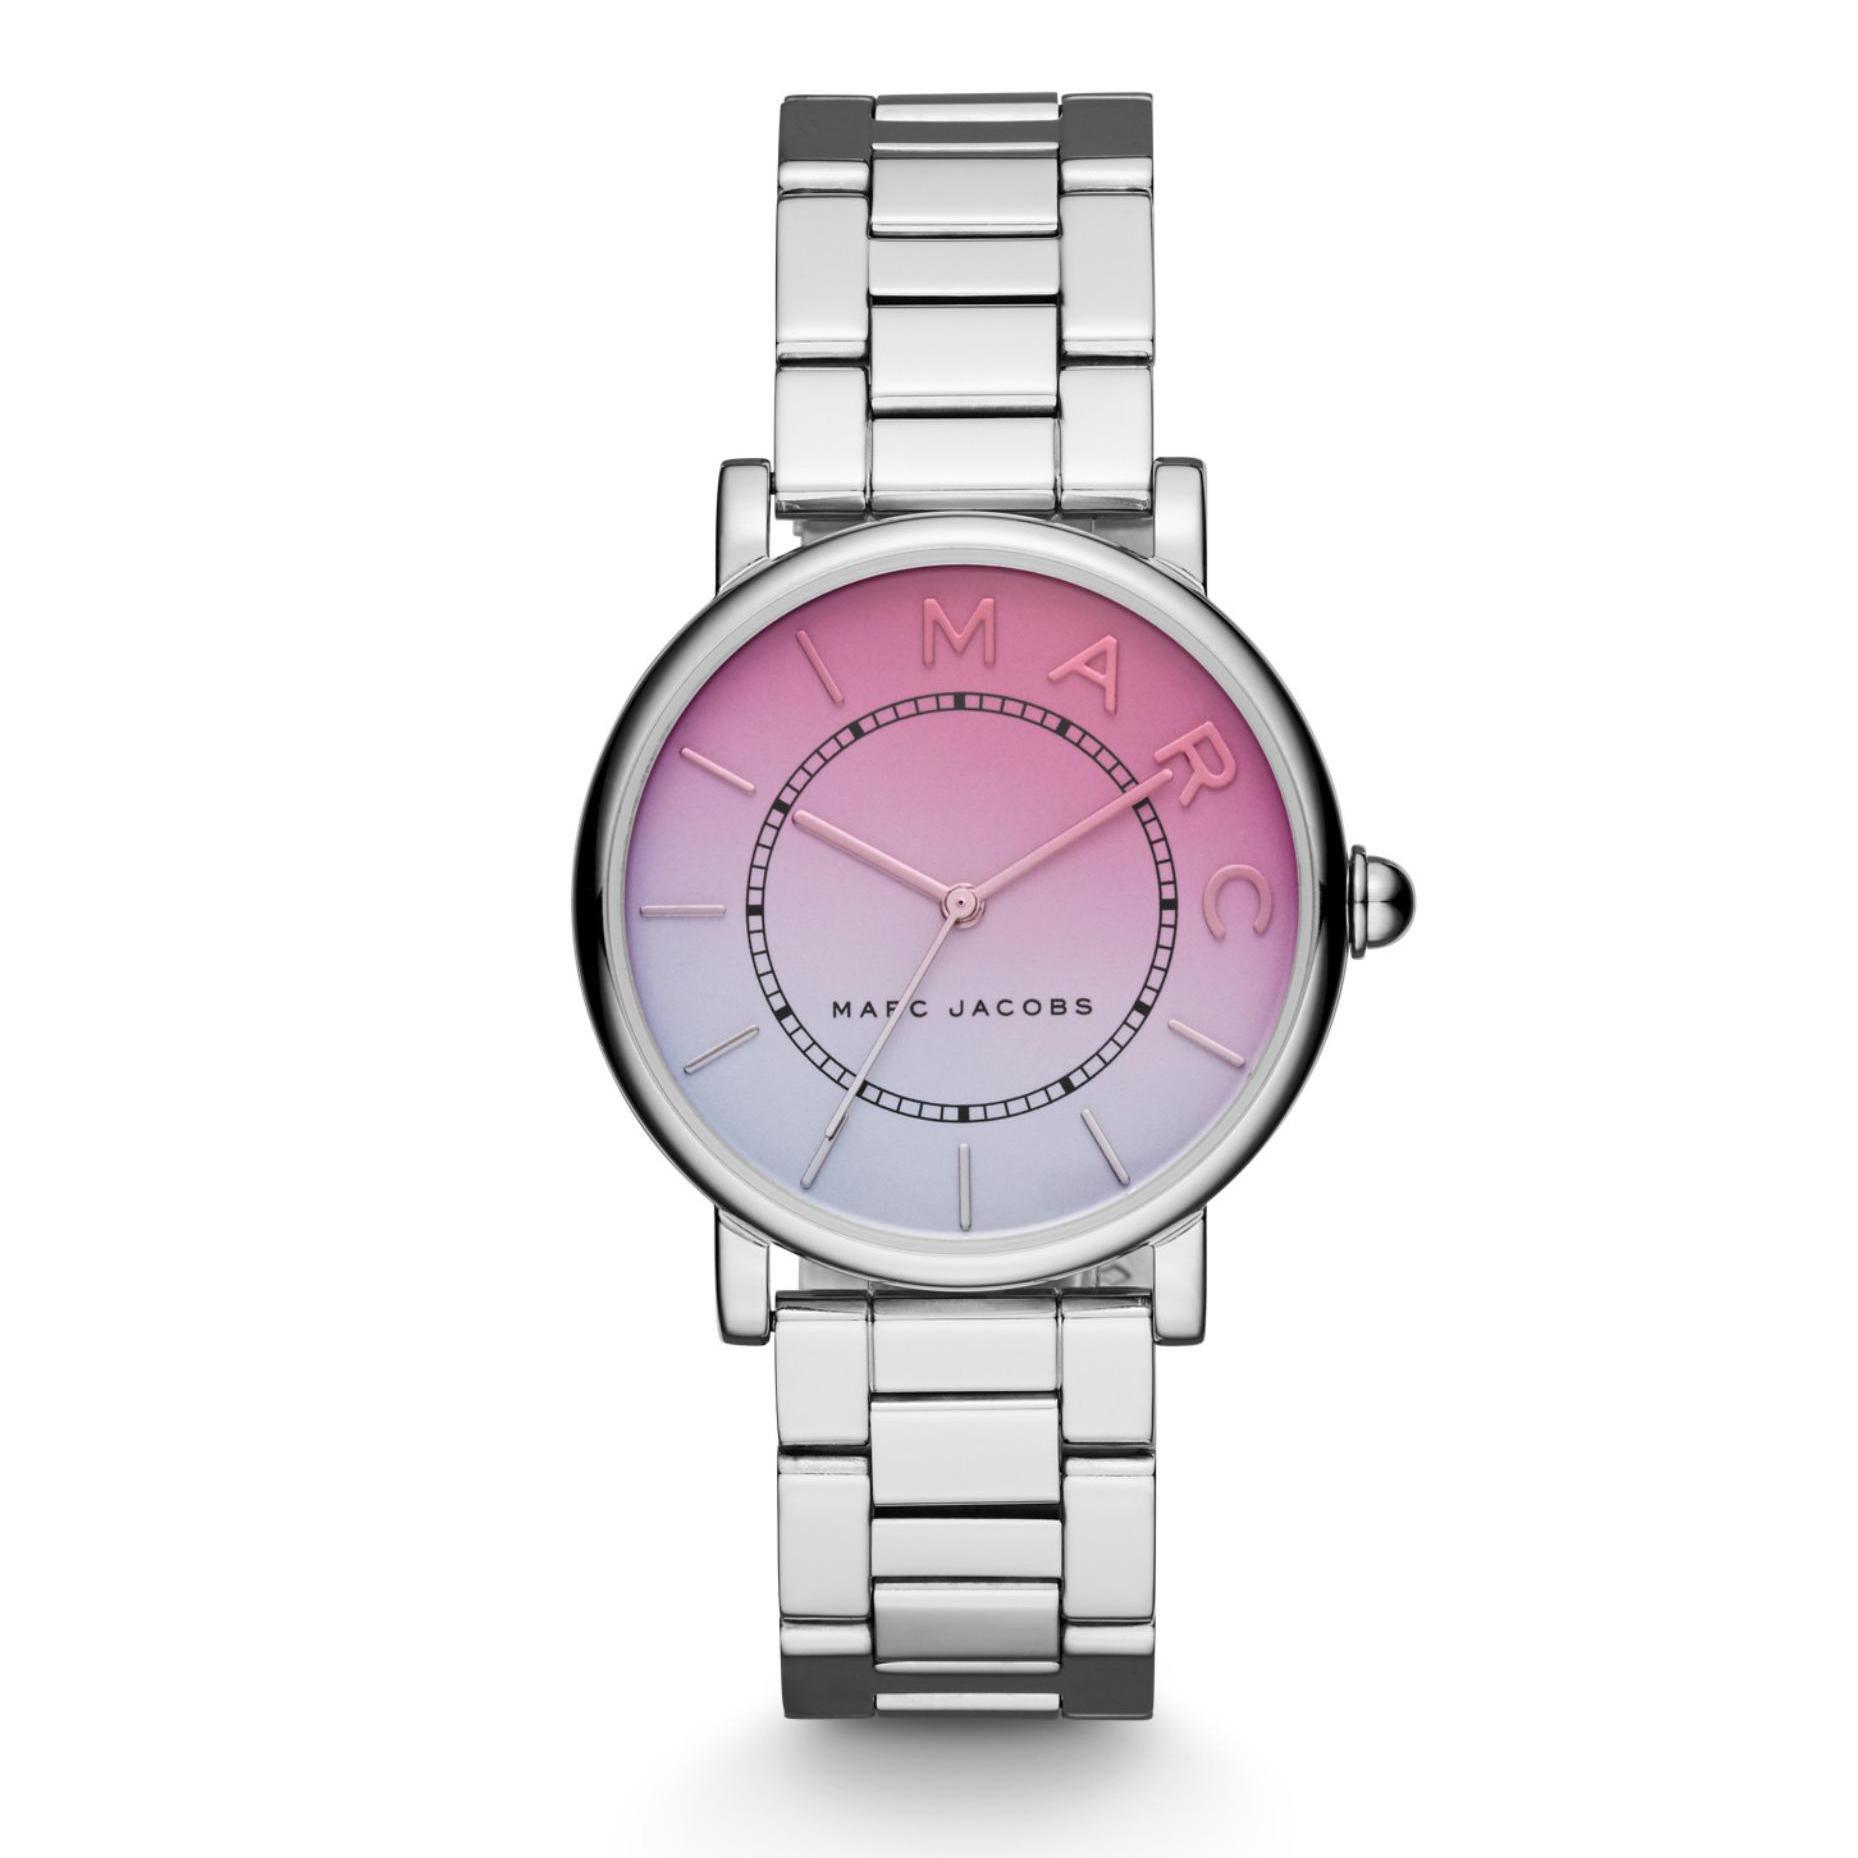 Marc By Marc Jacob Roxy Extensions - Silver - Jam Tangan Analog Wanita - MJ3552 - Original dan Garansi Watch Care